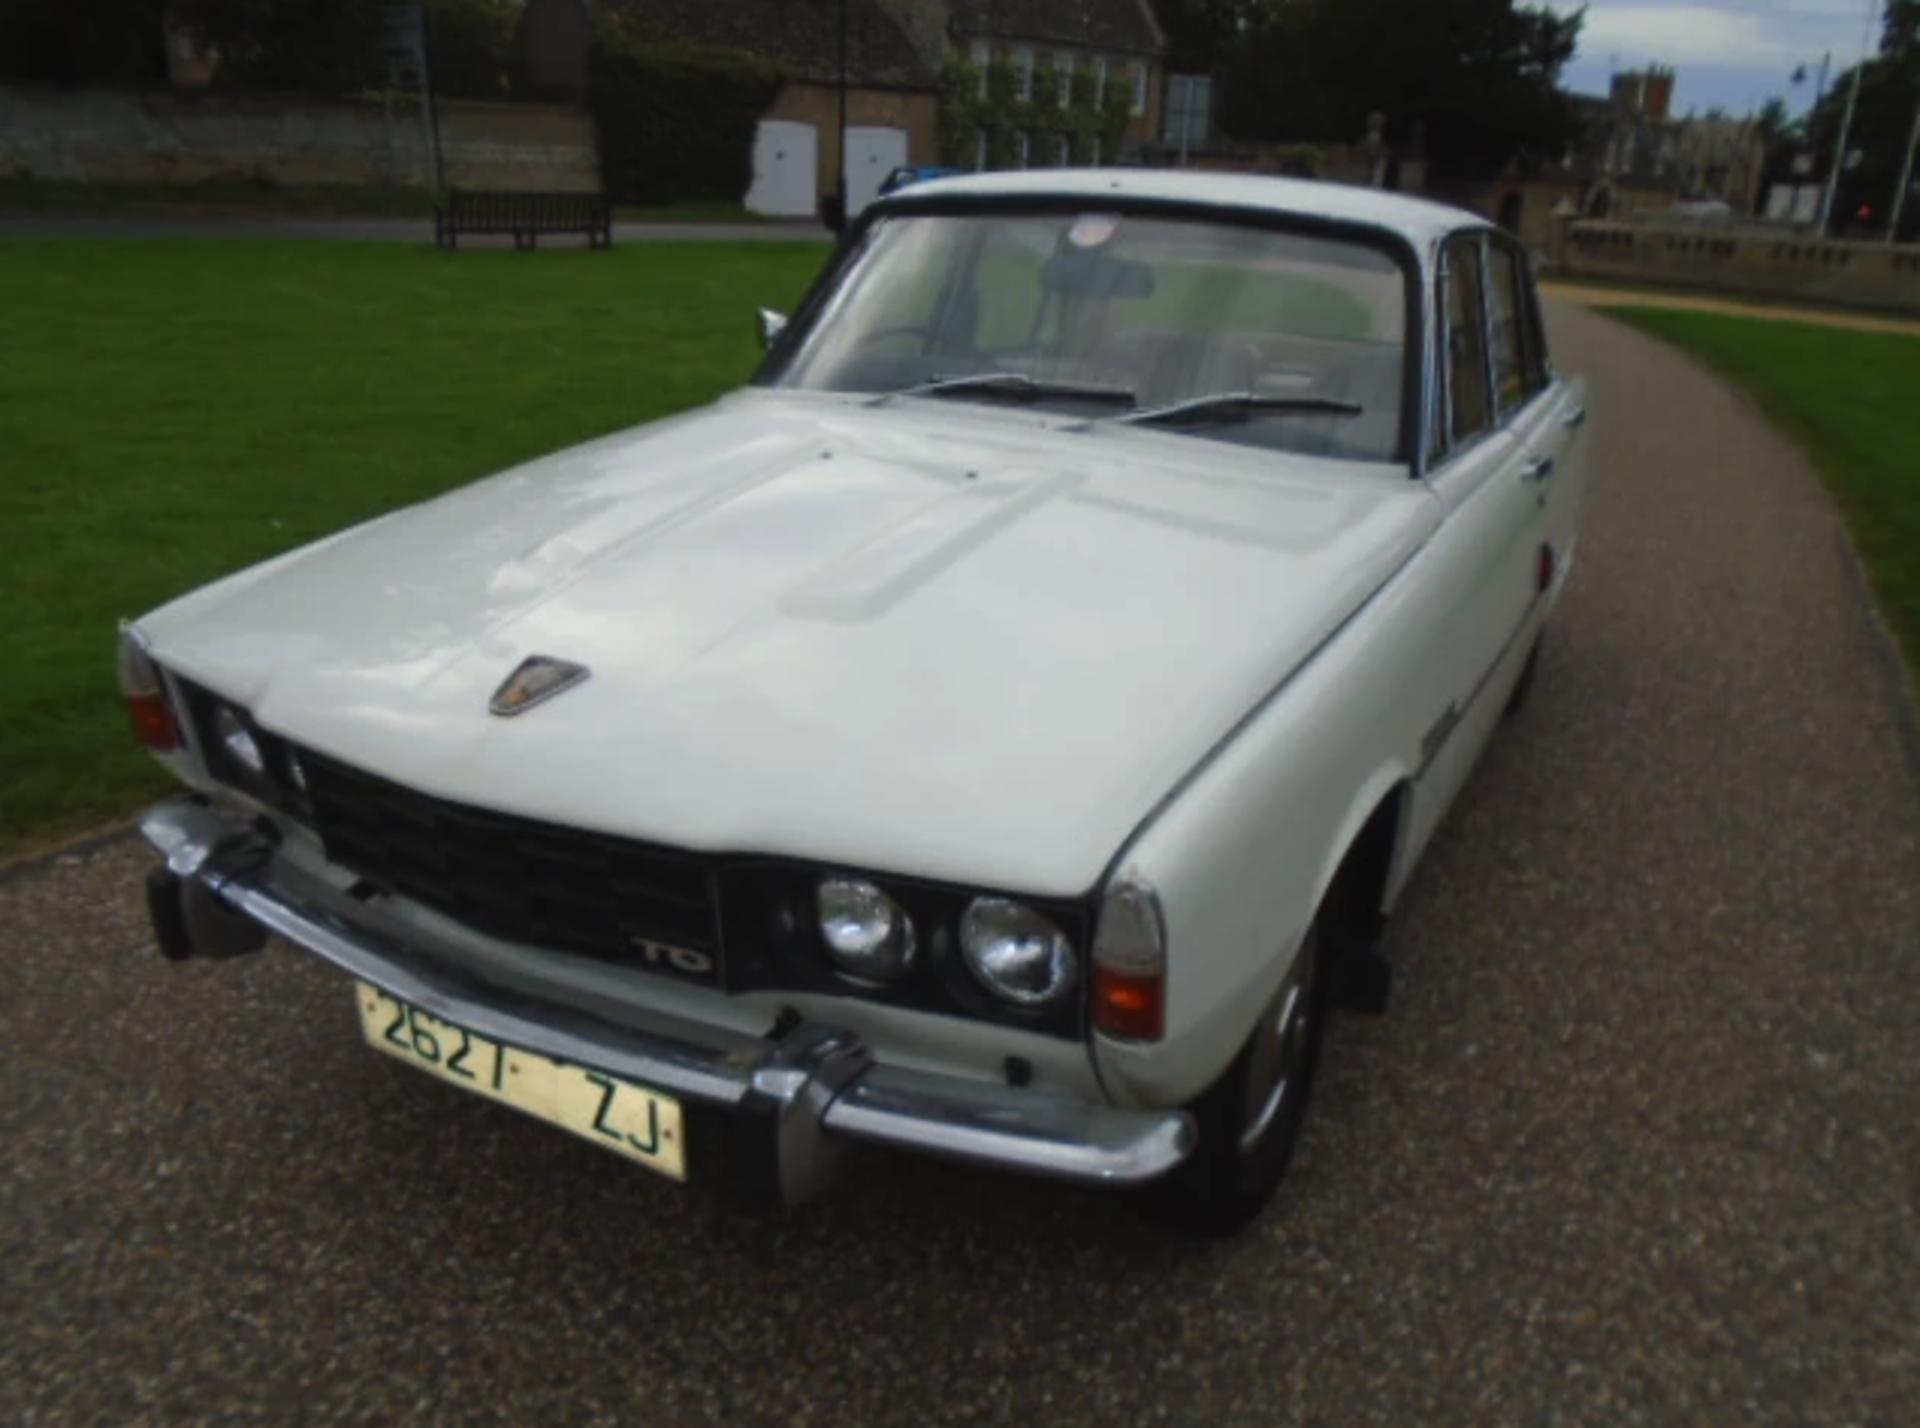 1973 Rover P6 2000 TC - Image 2 of 6